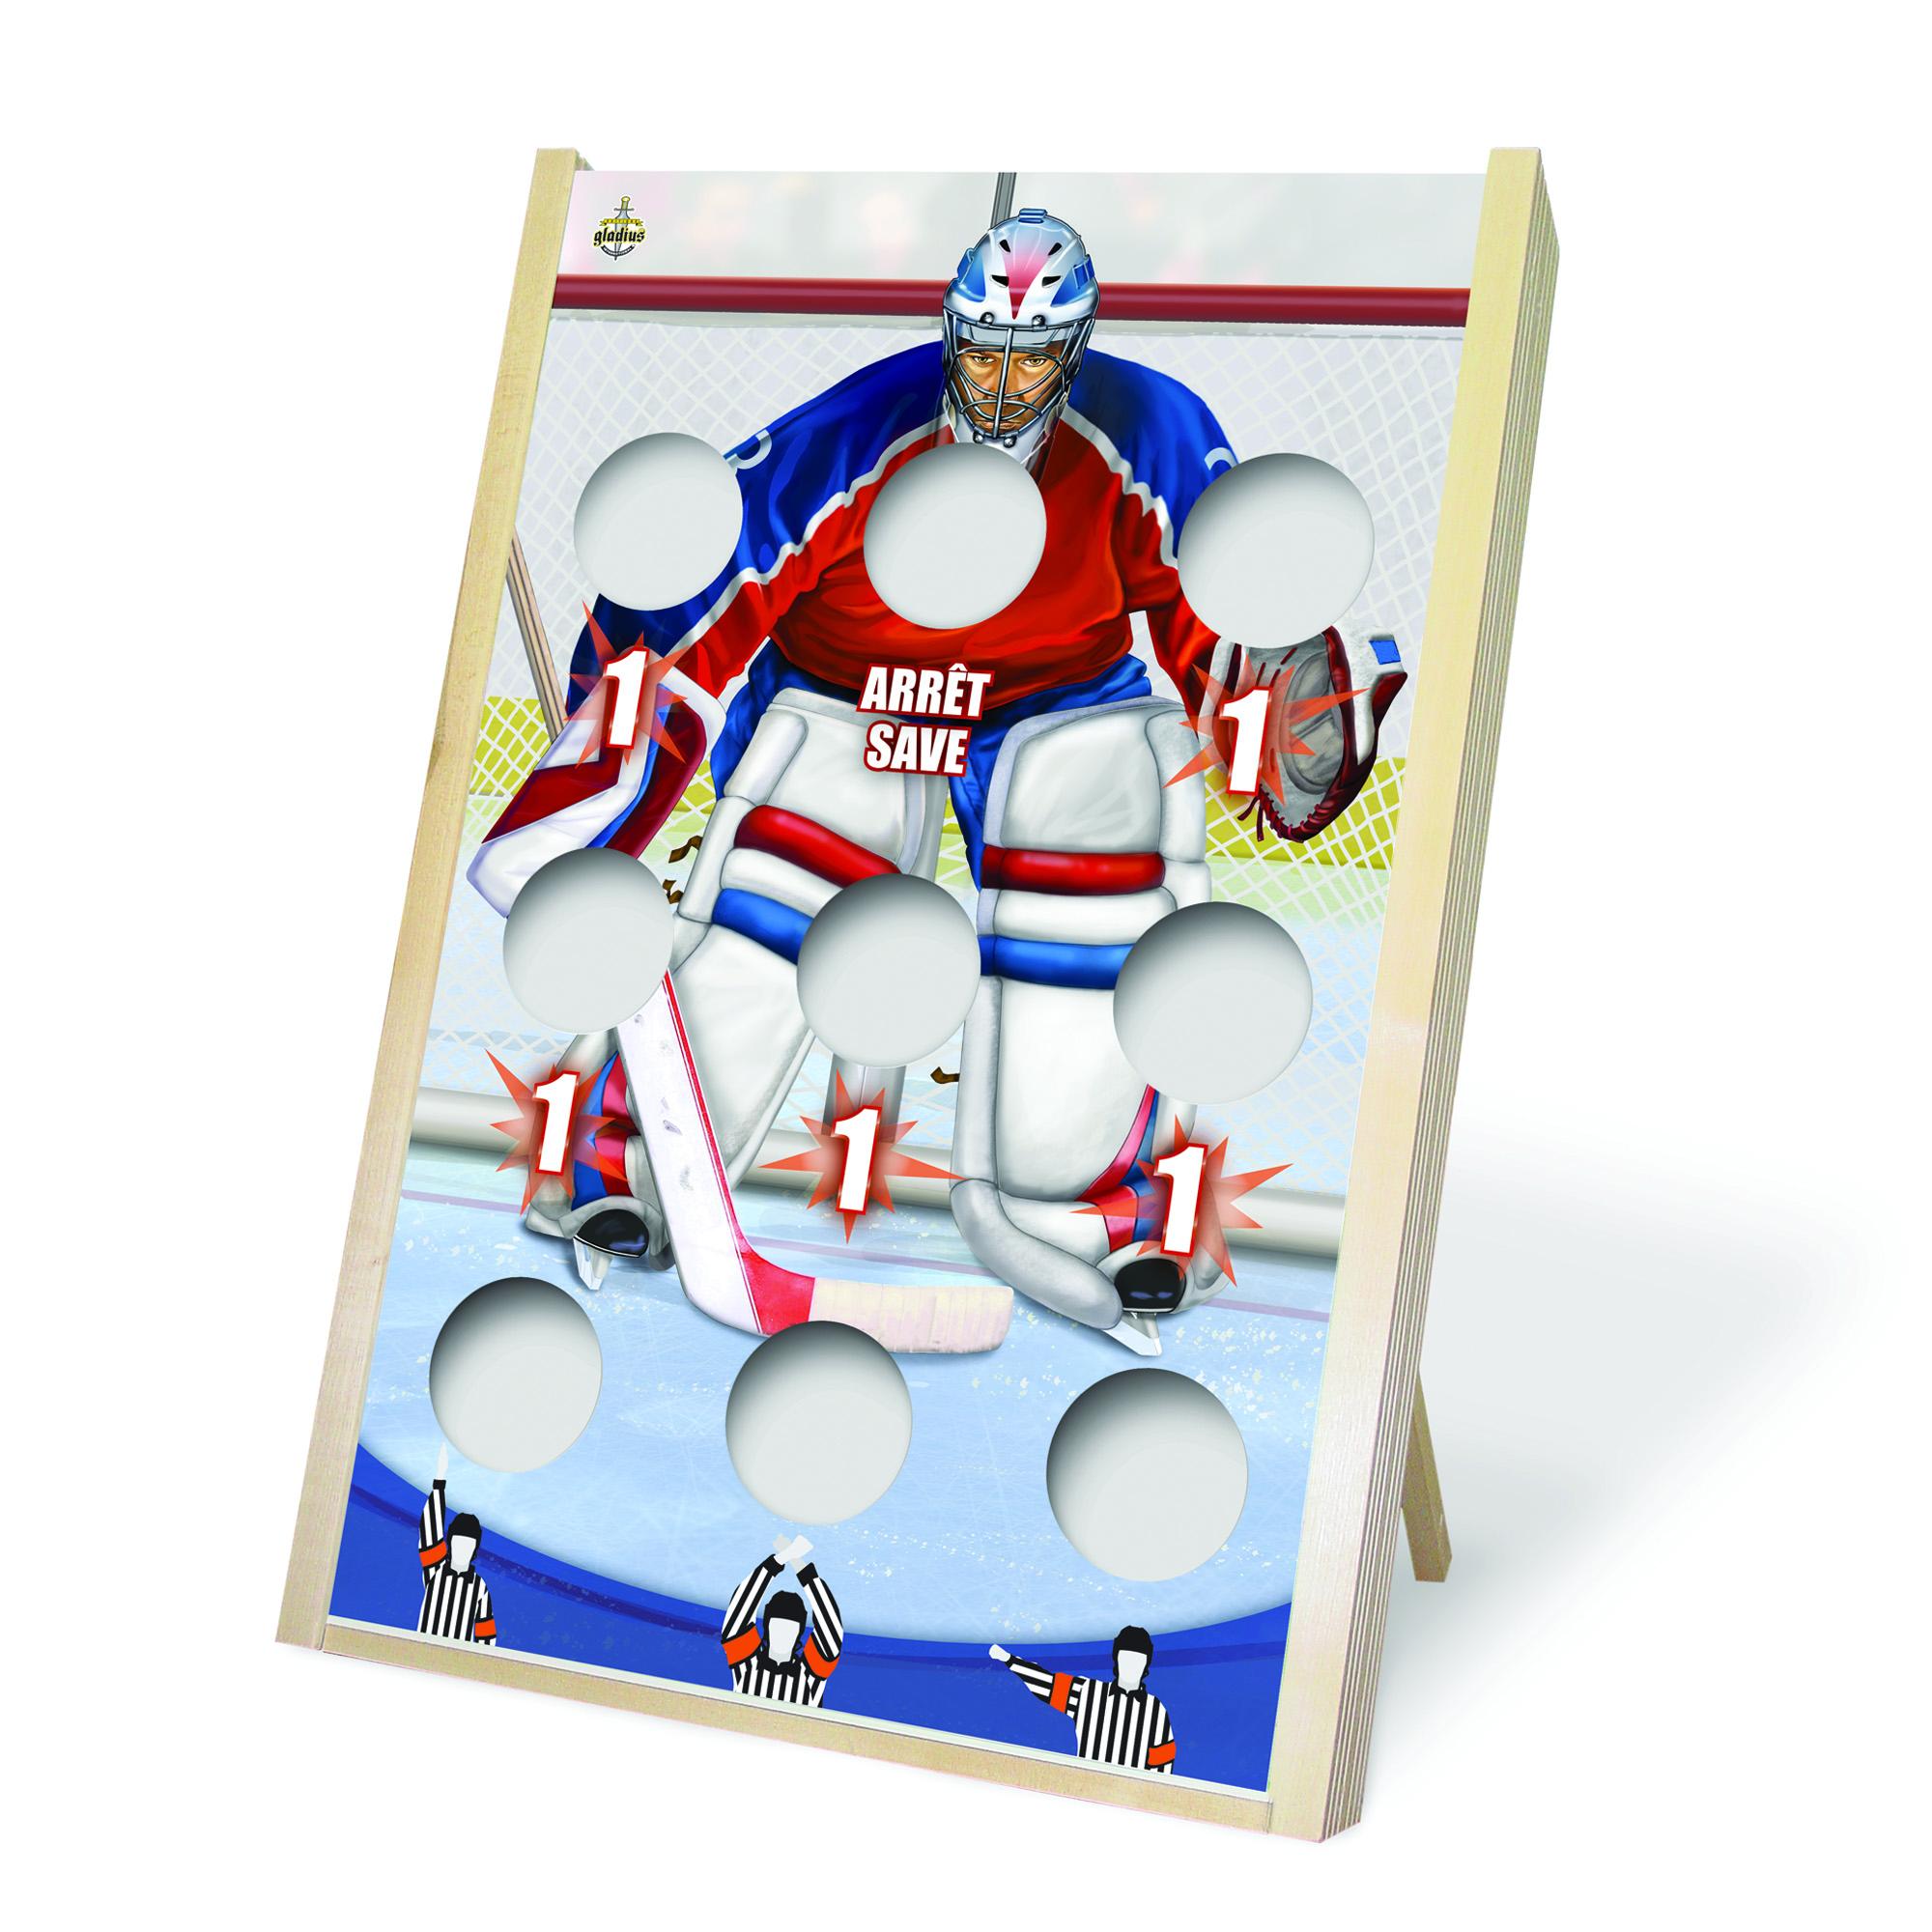 Jeu de poches - Planche hockey